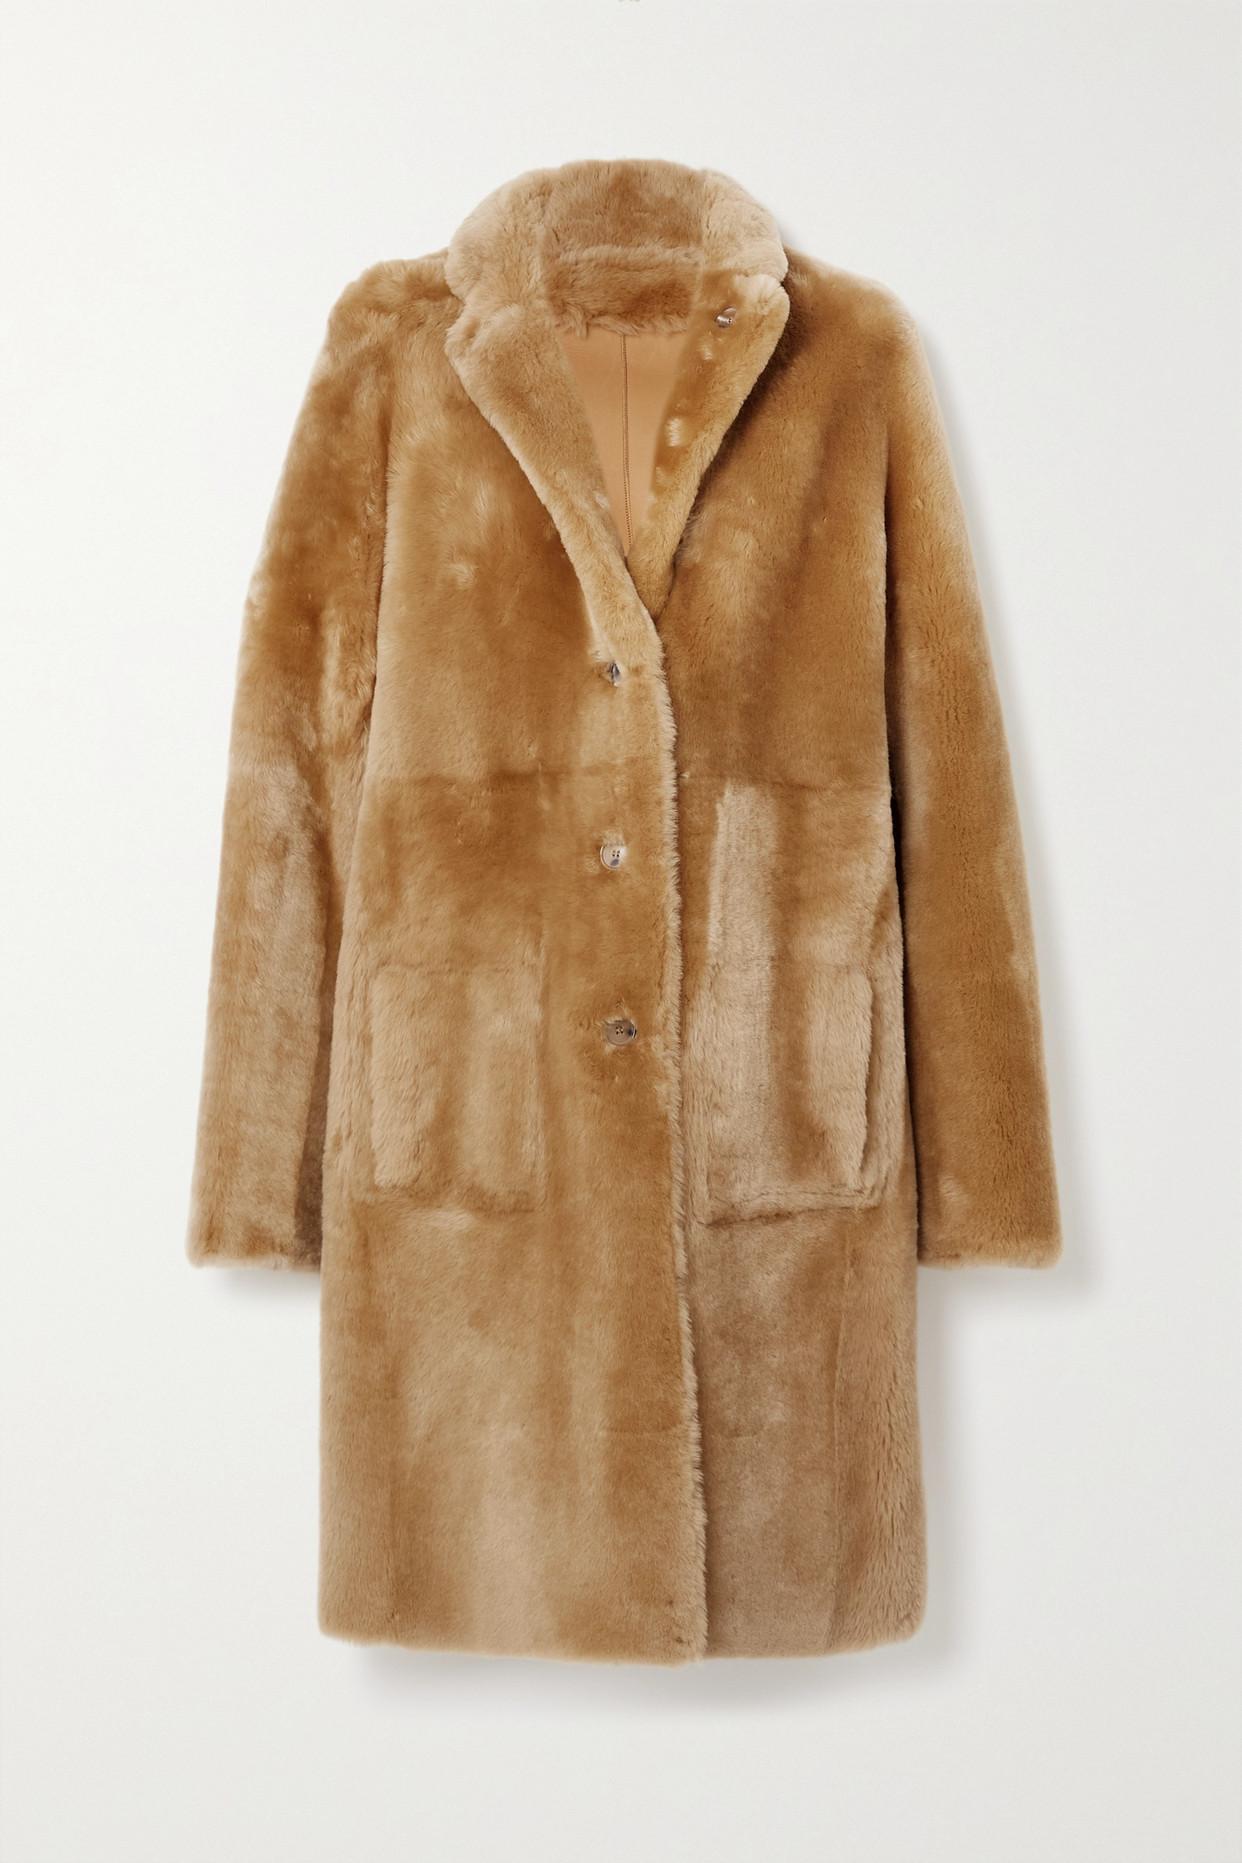 JOSEPH - Brittany 正反两穿羊毛皮外套 - 棕色 - FR40